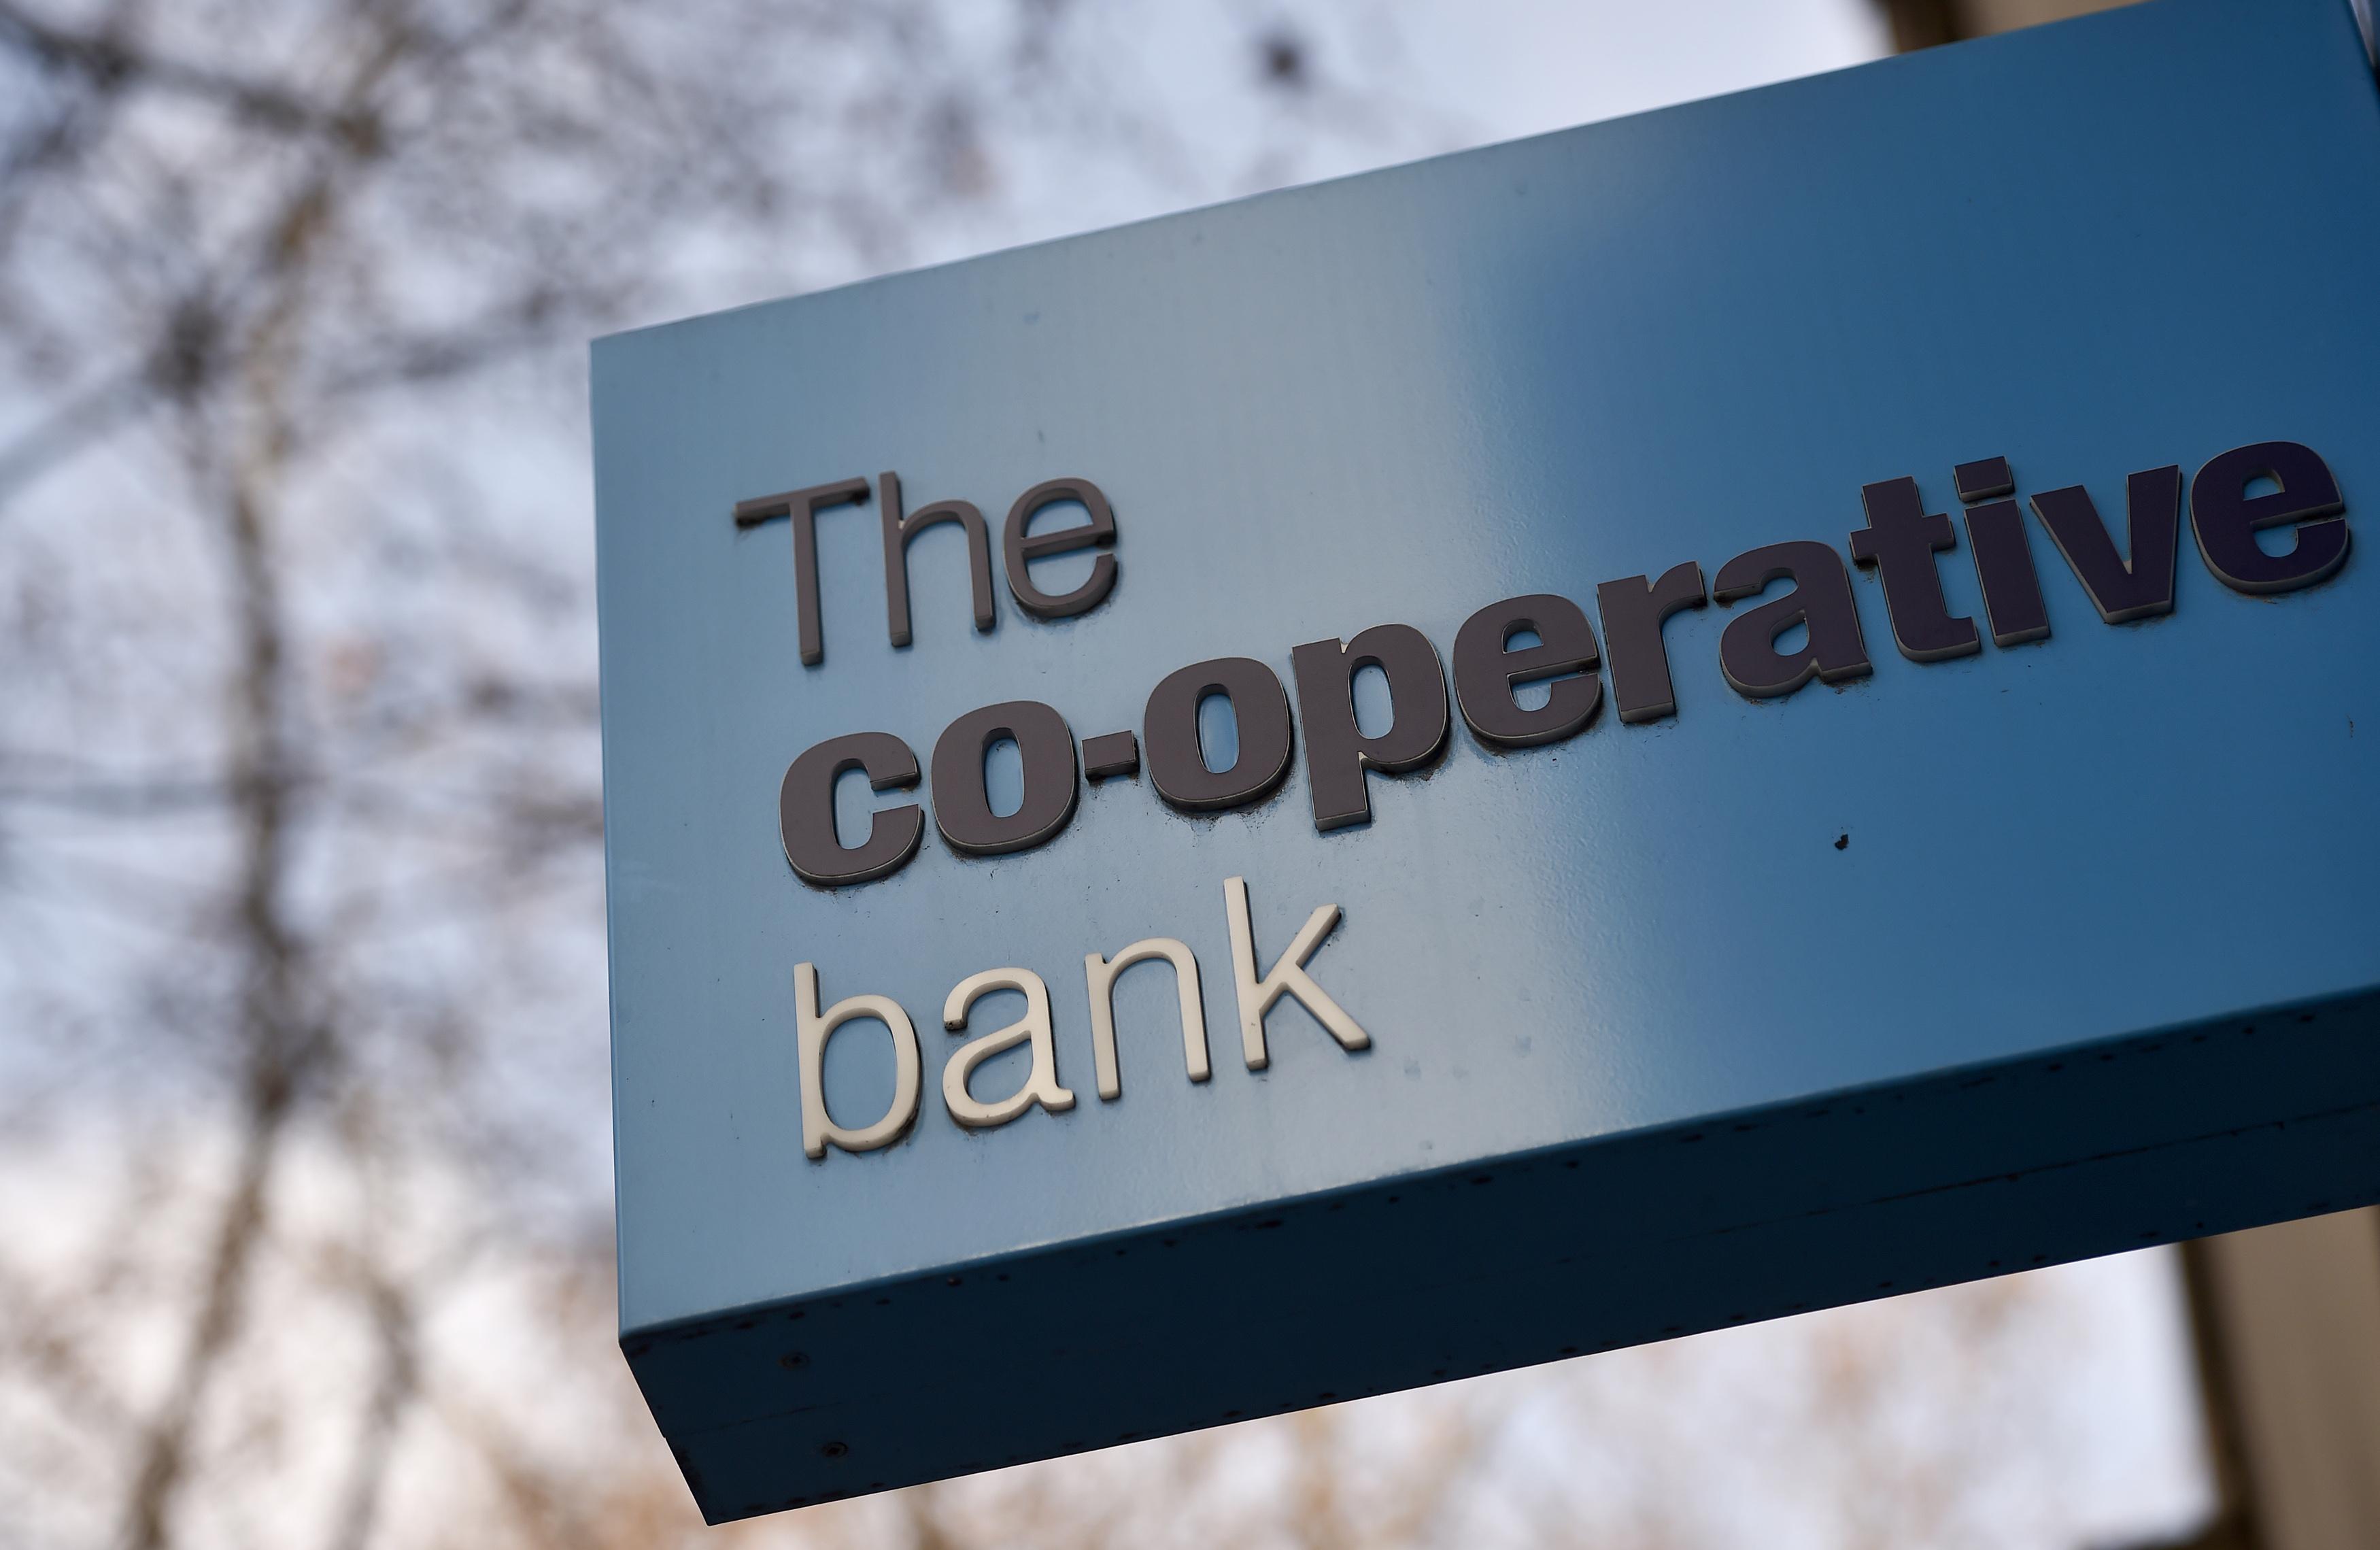 coop bailin would set bank creditors on edge � breakingviews